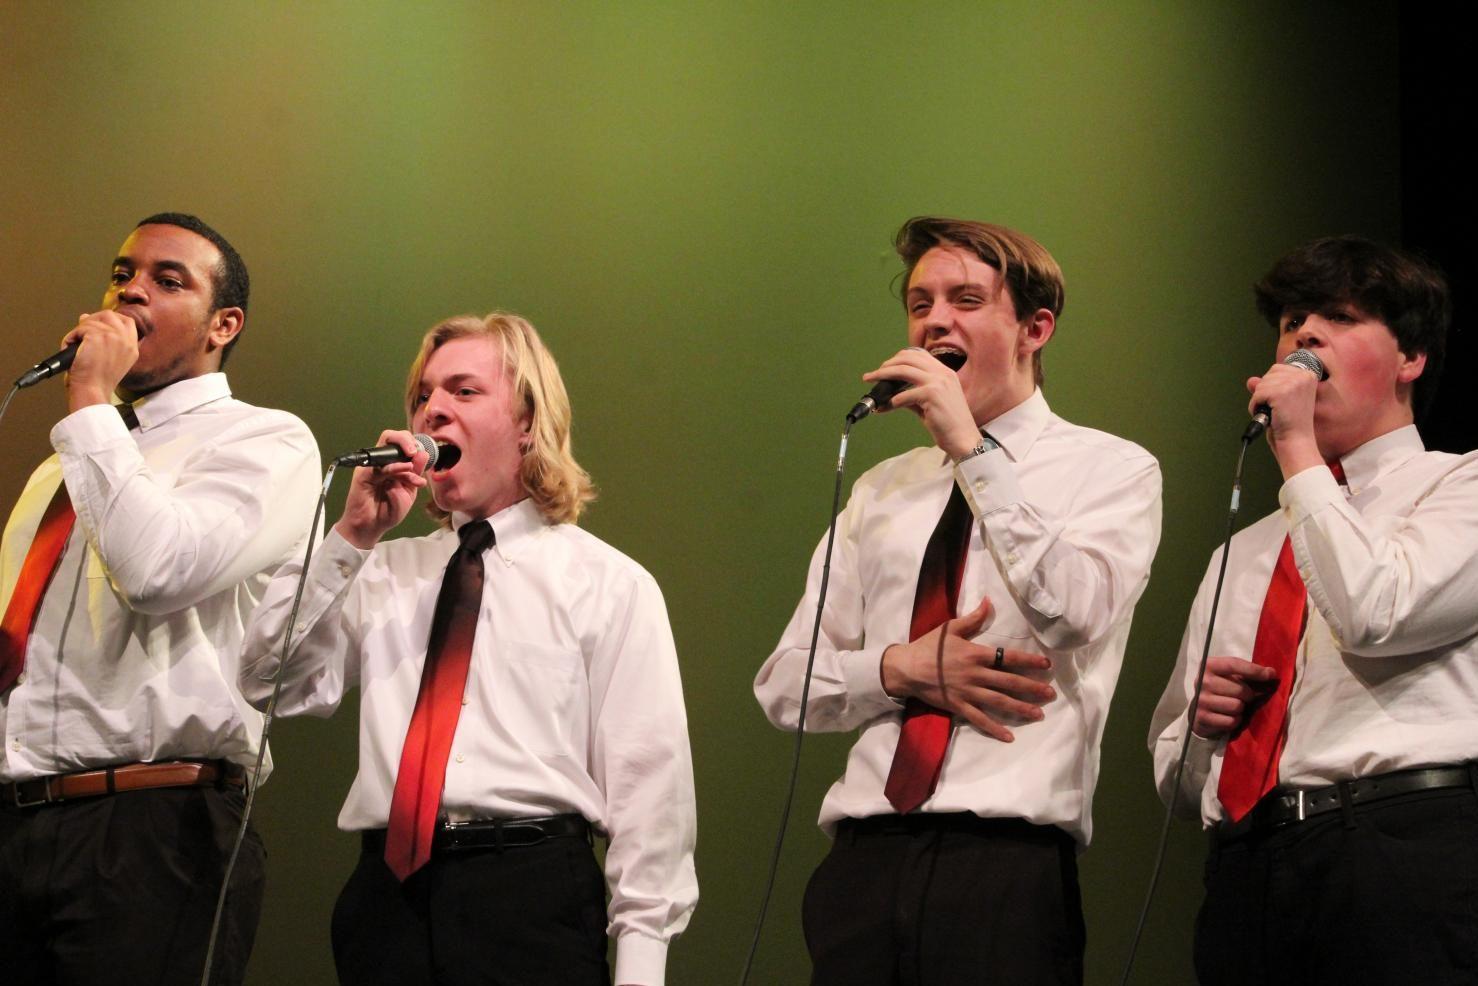 Anthony+Speech+and+Matt+Johnson%2C+seniors%2C+Xander+Piskulic%2C+sophomore+and+Mark+Perry%2C+junior%2C+sing+for+the+Kaleidoscope+Vocal+Jazz+Ensemble.+